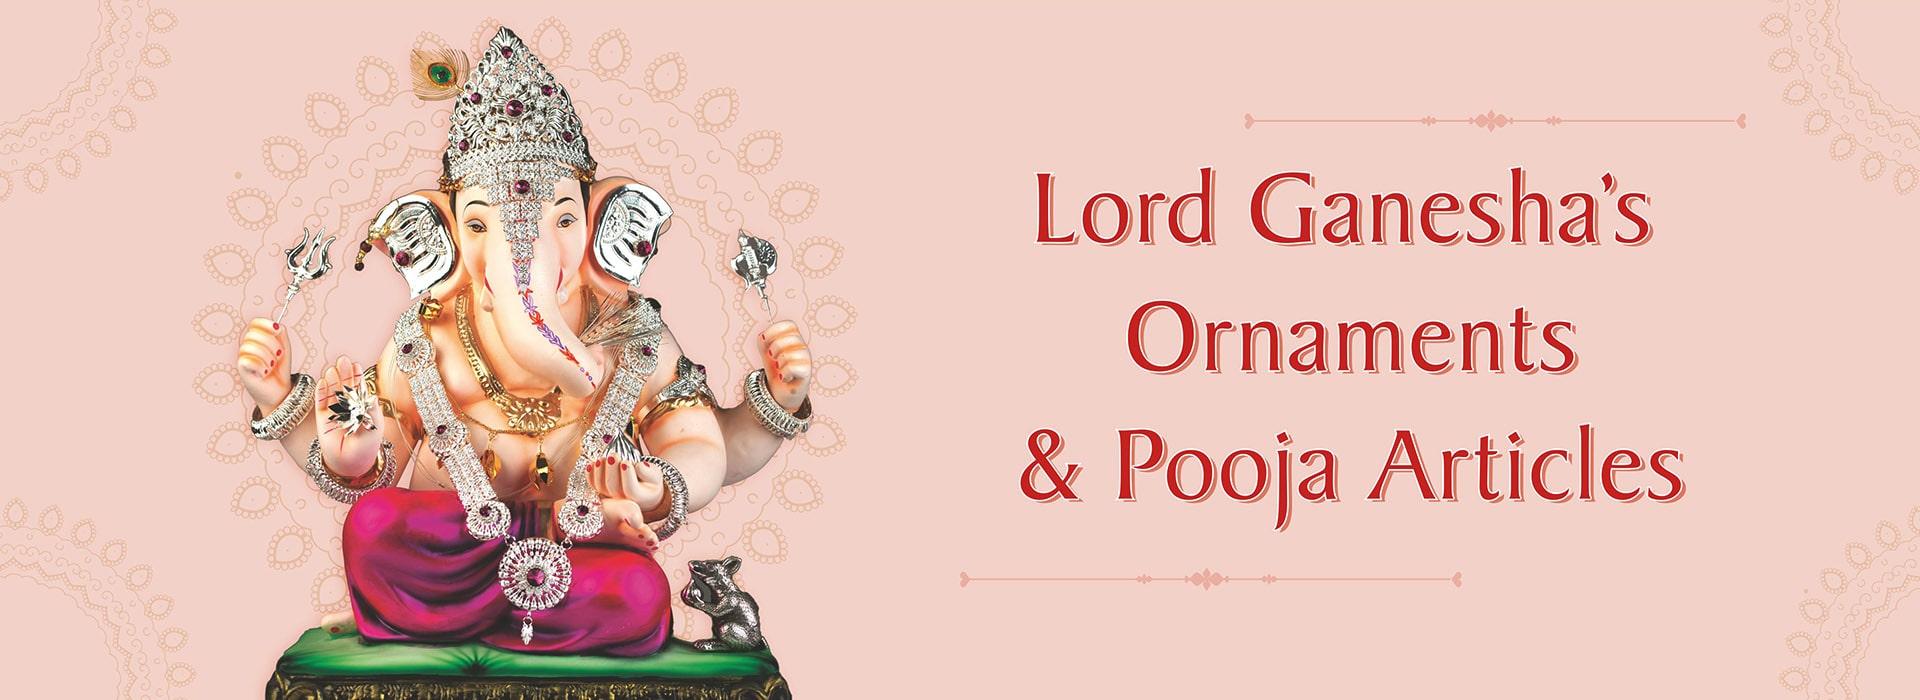 Lord Ganesha Ornaments and Pooja Sahitya